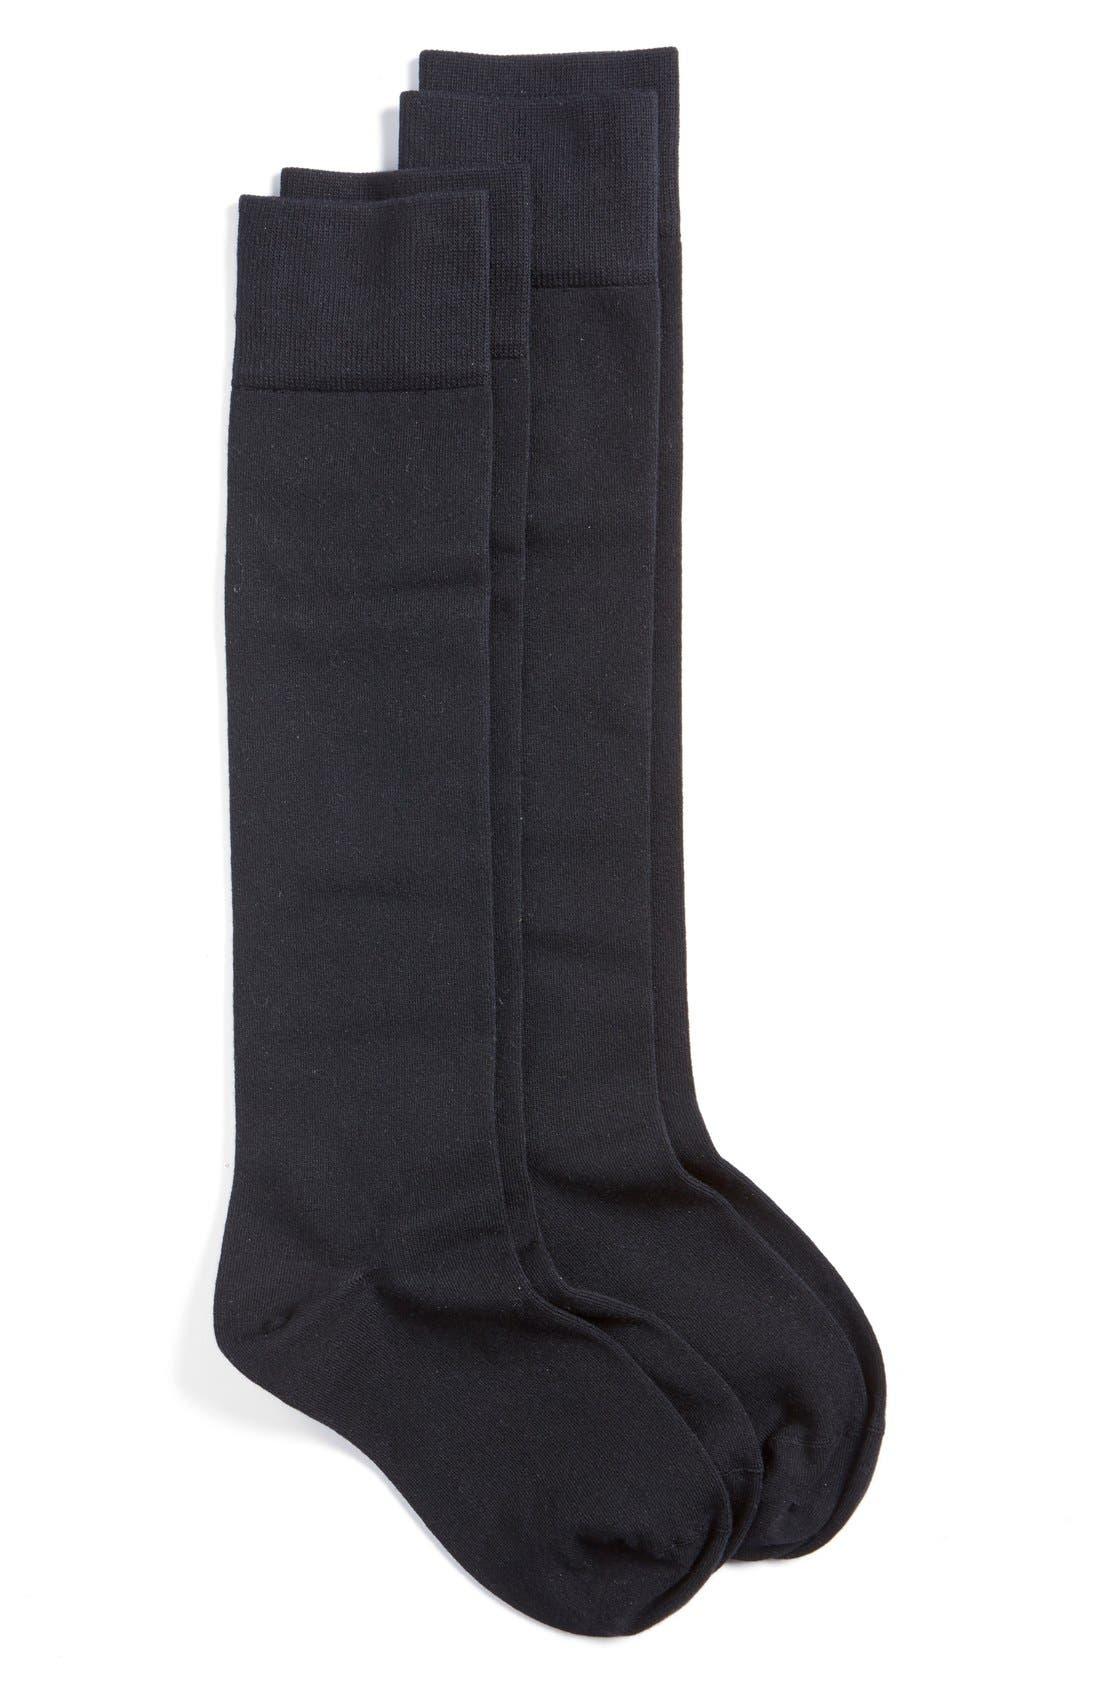 Alternate Image 1 Selected - Nordstrom 2-Pack Knee High Socks